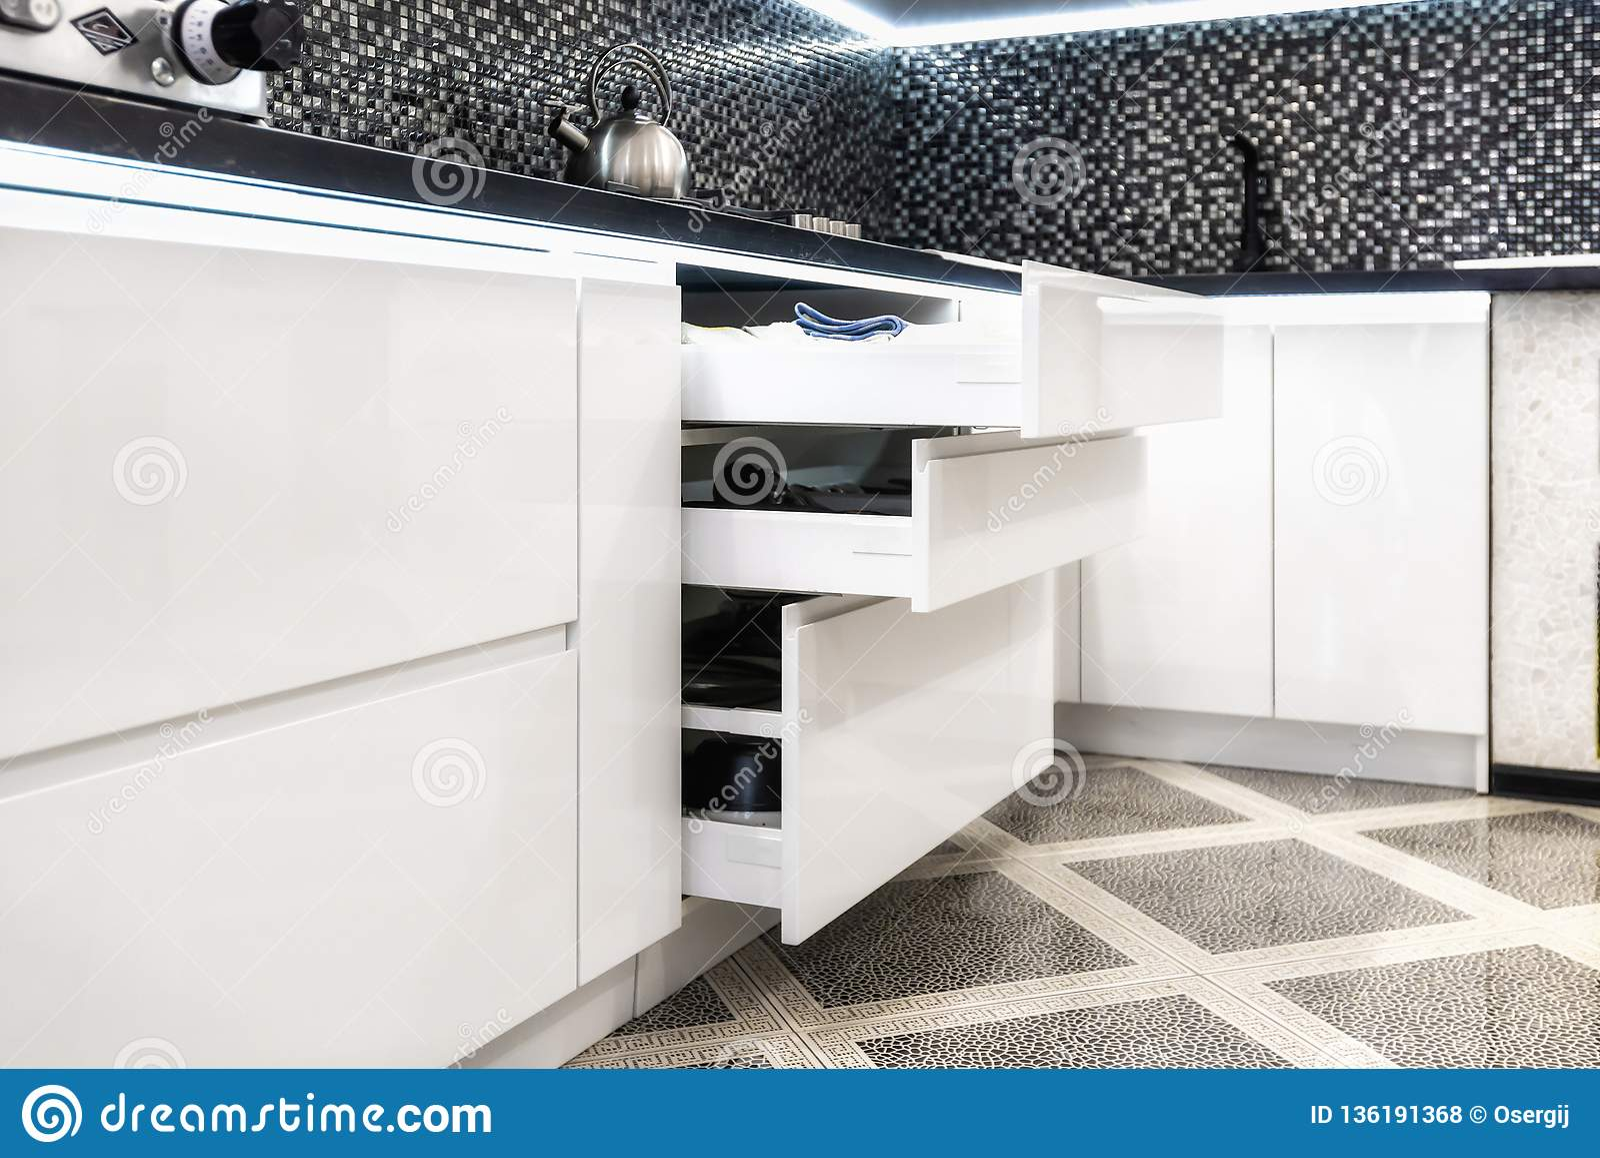 Enhet med plattor i ett modernt kök